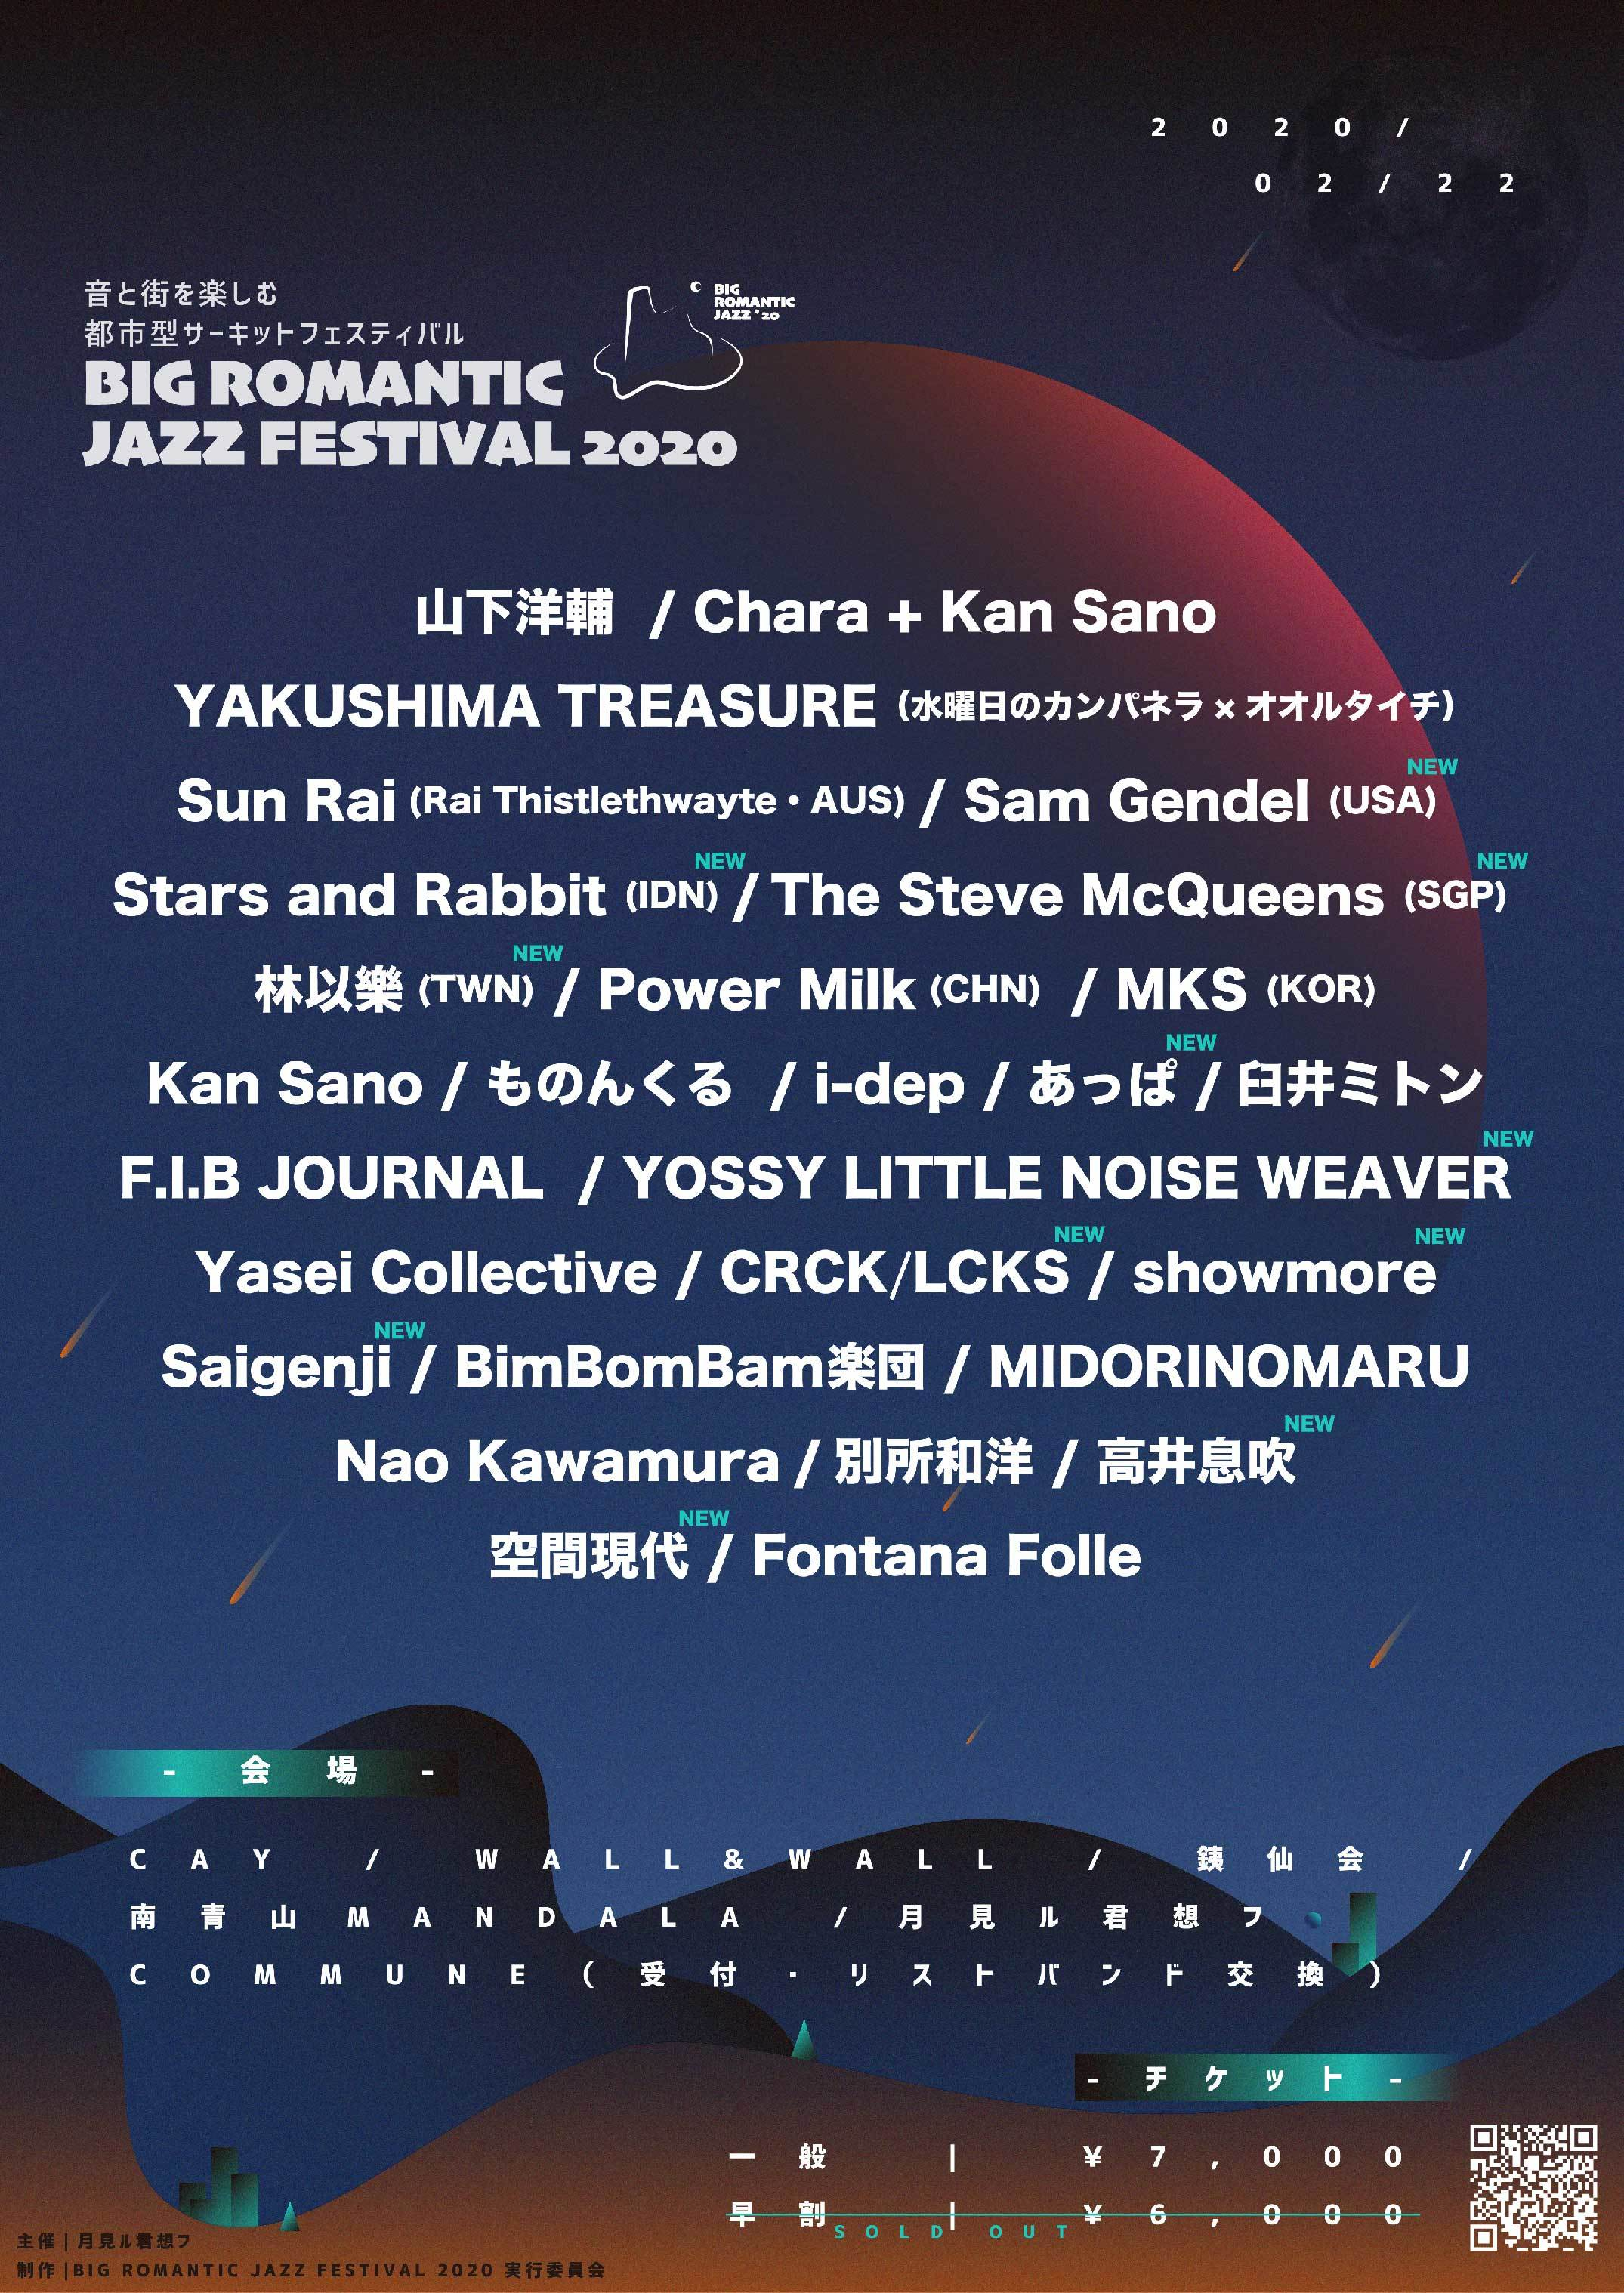 BIG ROMANTIC JAZZ FESTIVAL 2020